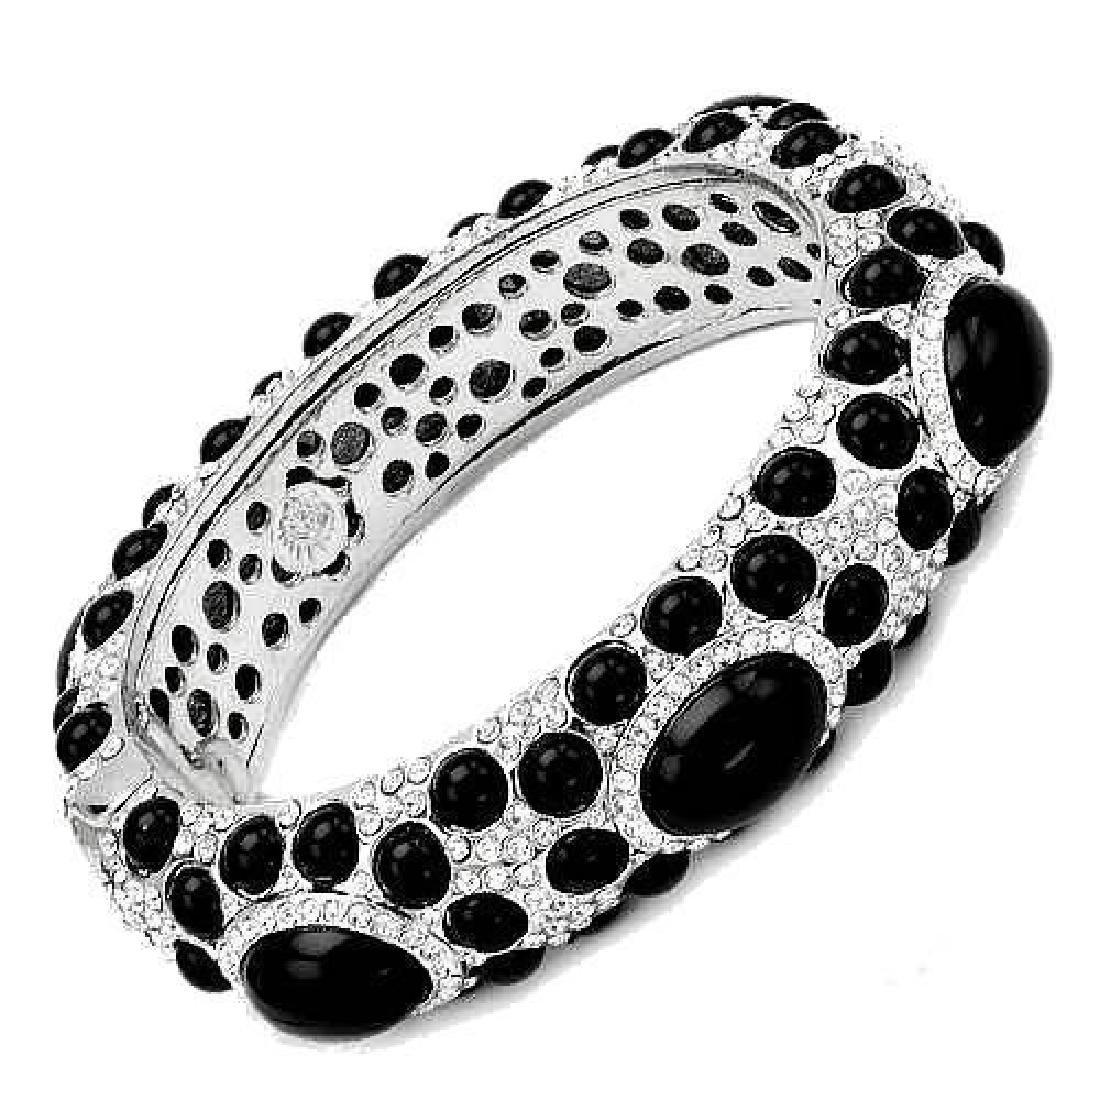 Angelique de Paris Onyx Swarovski Crystal Bracelet